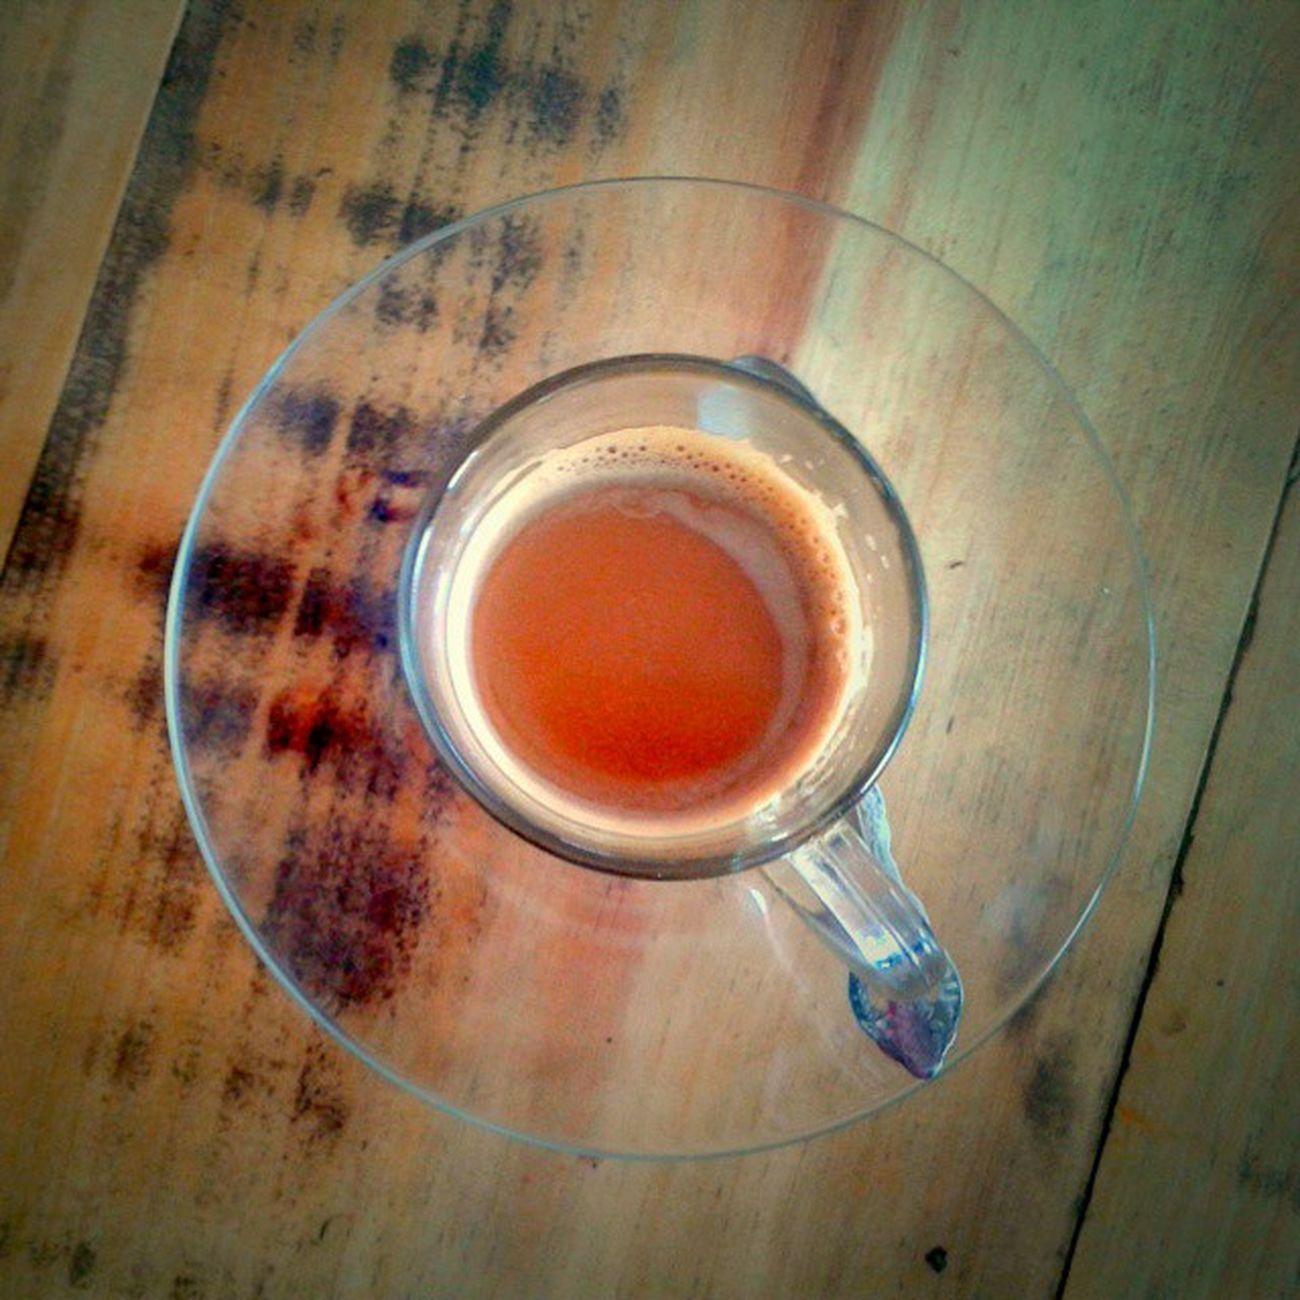 Sanger arabica biar ga ngantuk Coffee Cafe Instacoffee Tagsforlikes .com Cafelife Caffeine Hot Mug Drink Coffeeaddict Coffeegram Coffeeoftheday Cotd Coffeelover Coffeelovers Coffeeholic Coffiecup Coffeelove Coffeemug TagsForLikesApp Coffeeholic Coffeelife Aceh